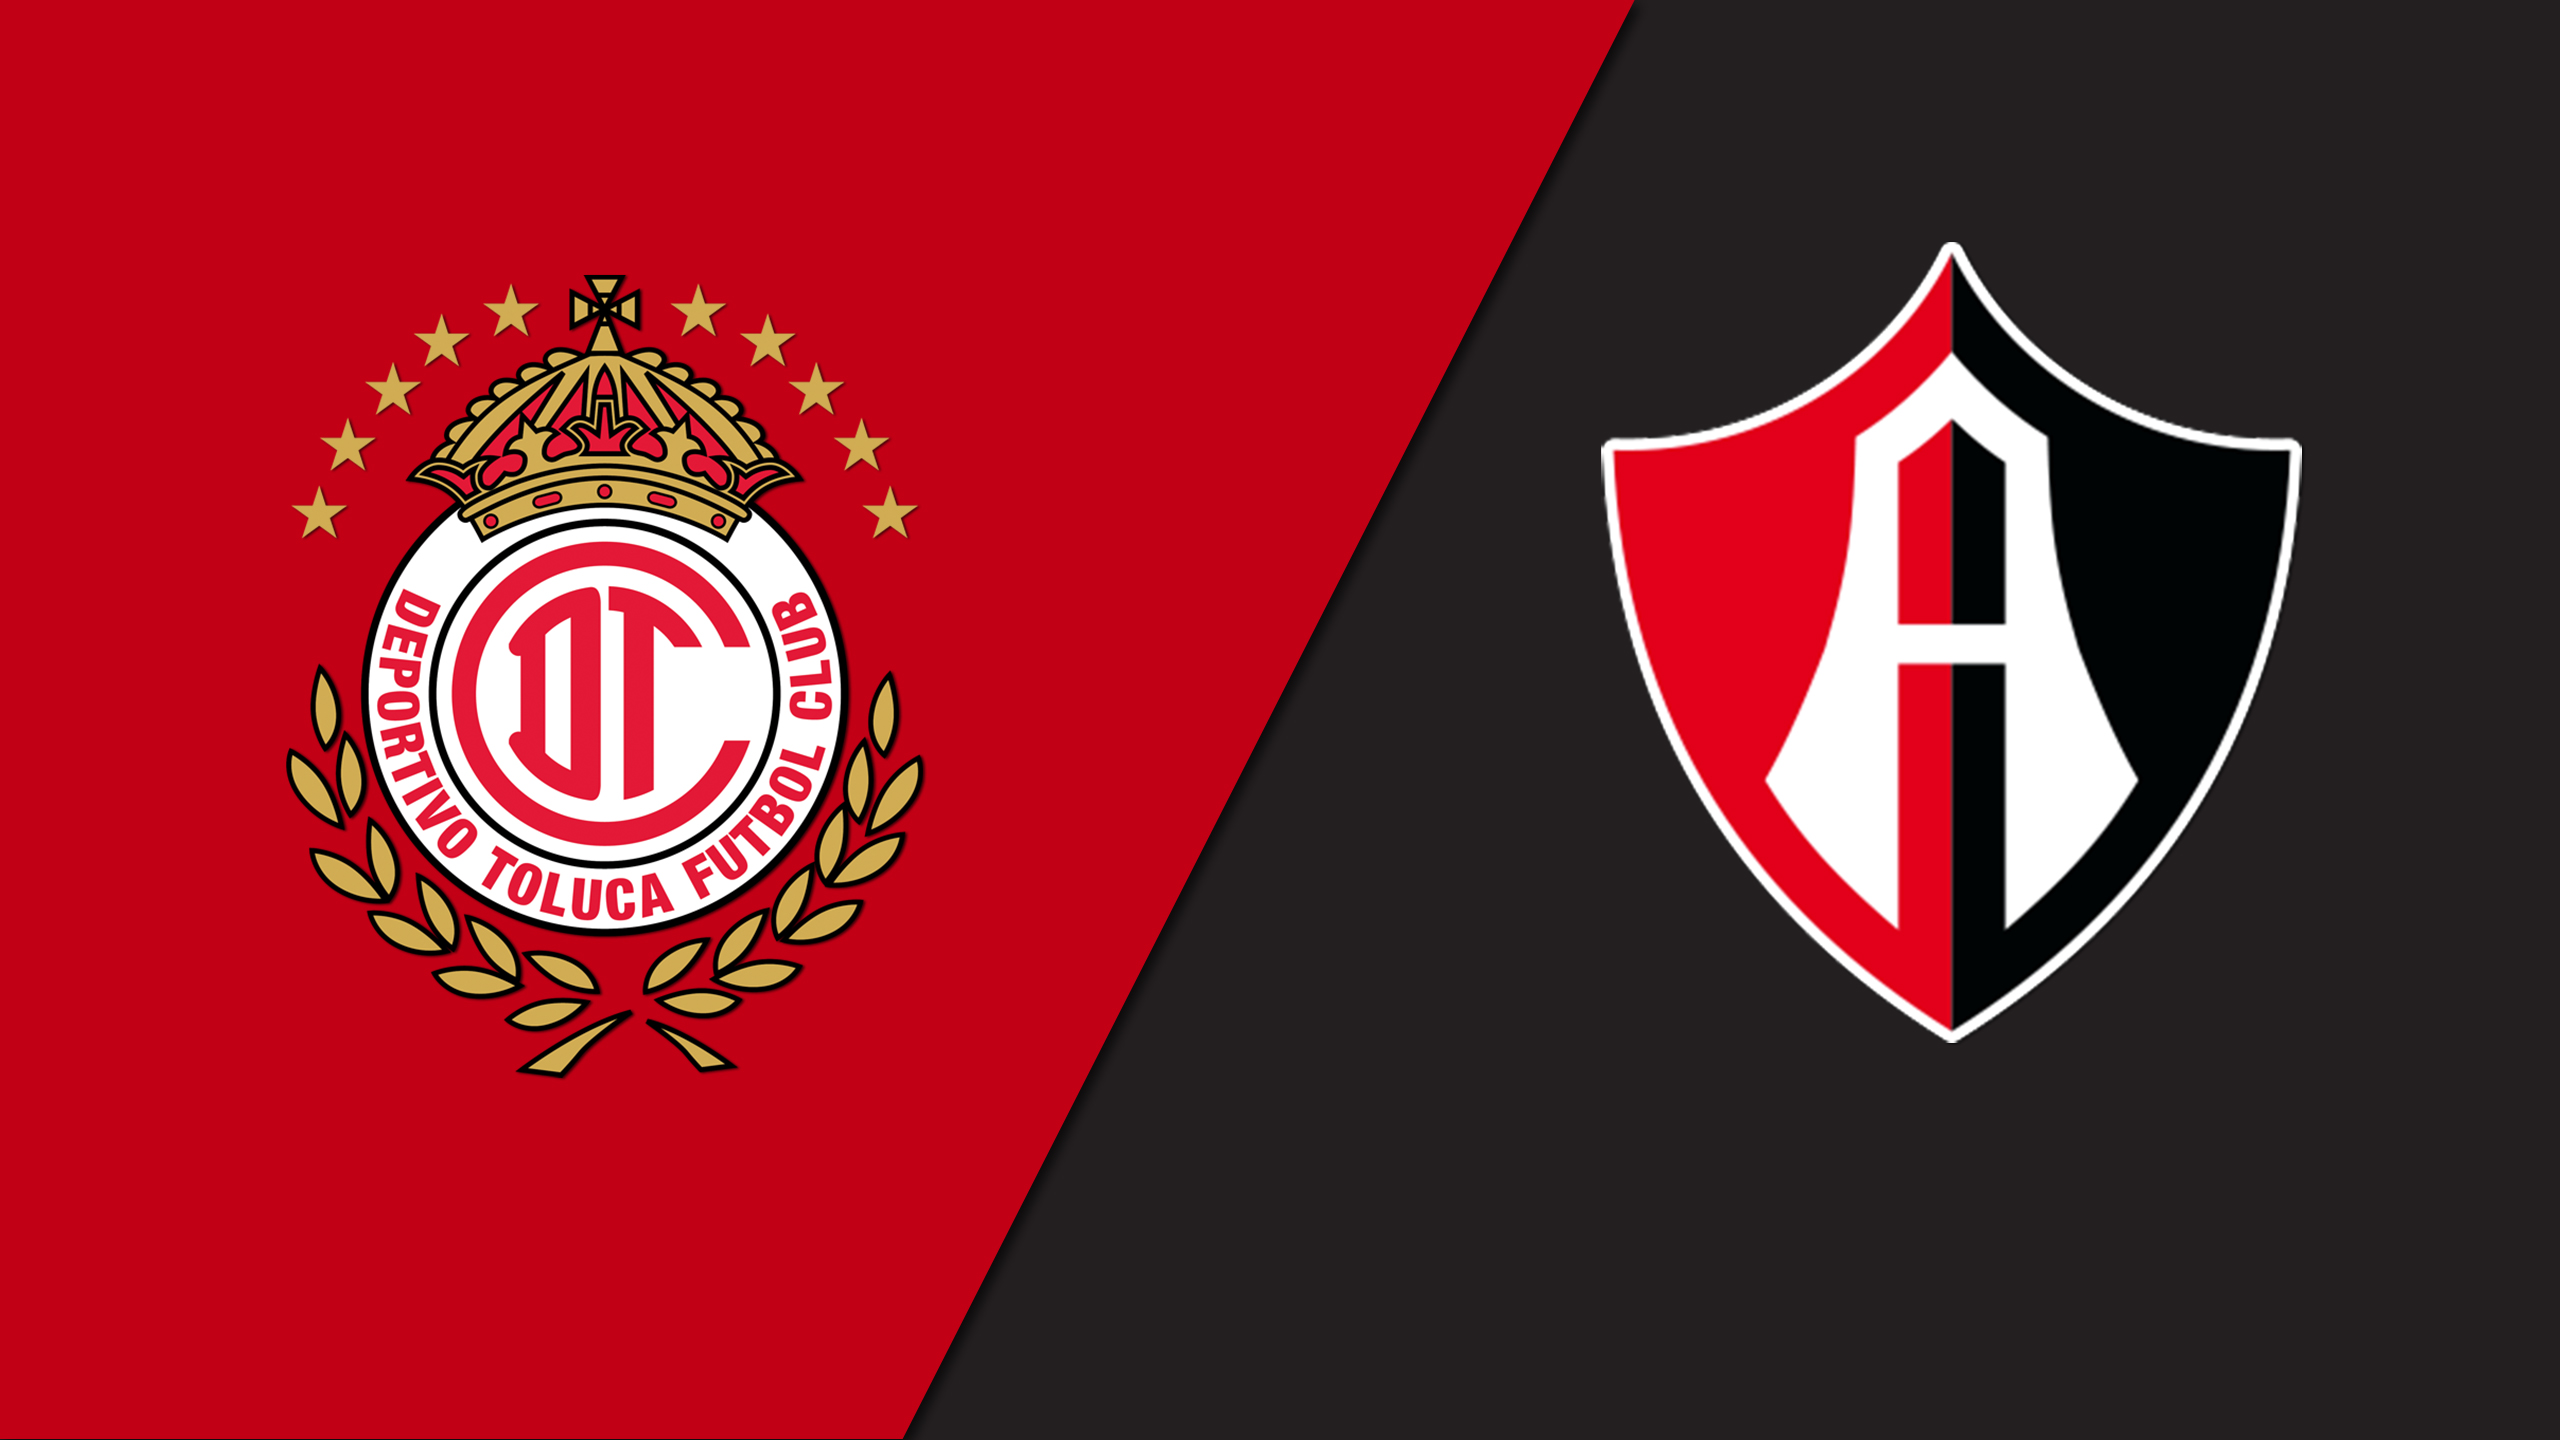 Diablos Rojos del Toluca vs. Club Atlas de Guadalajara (Jornada 11)